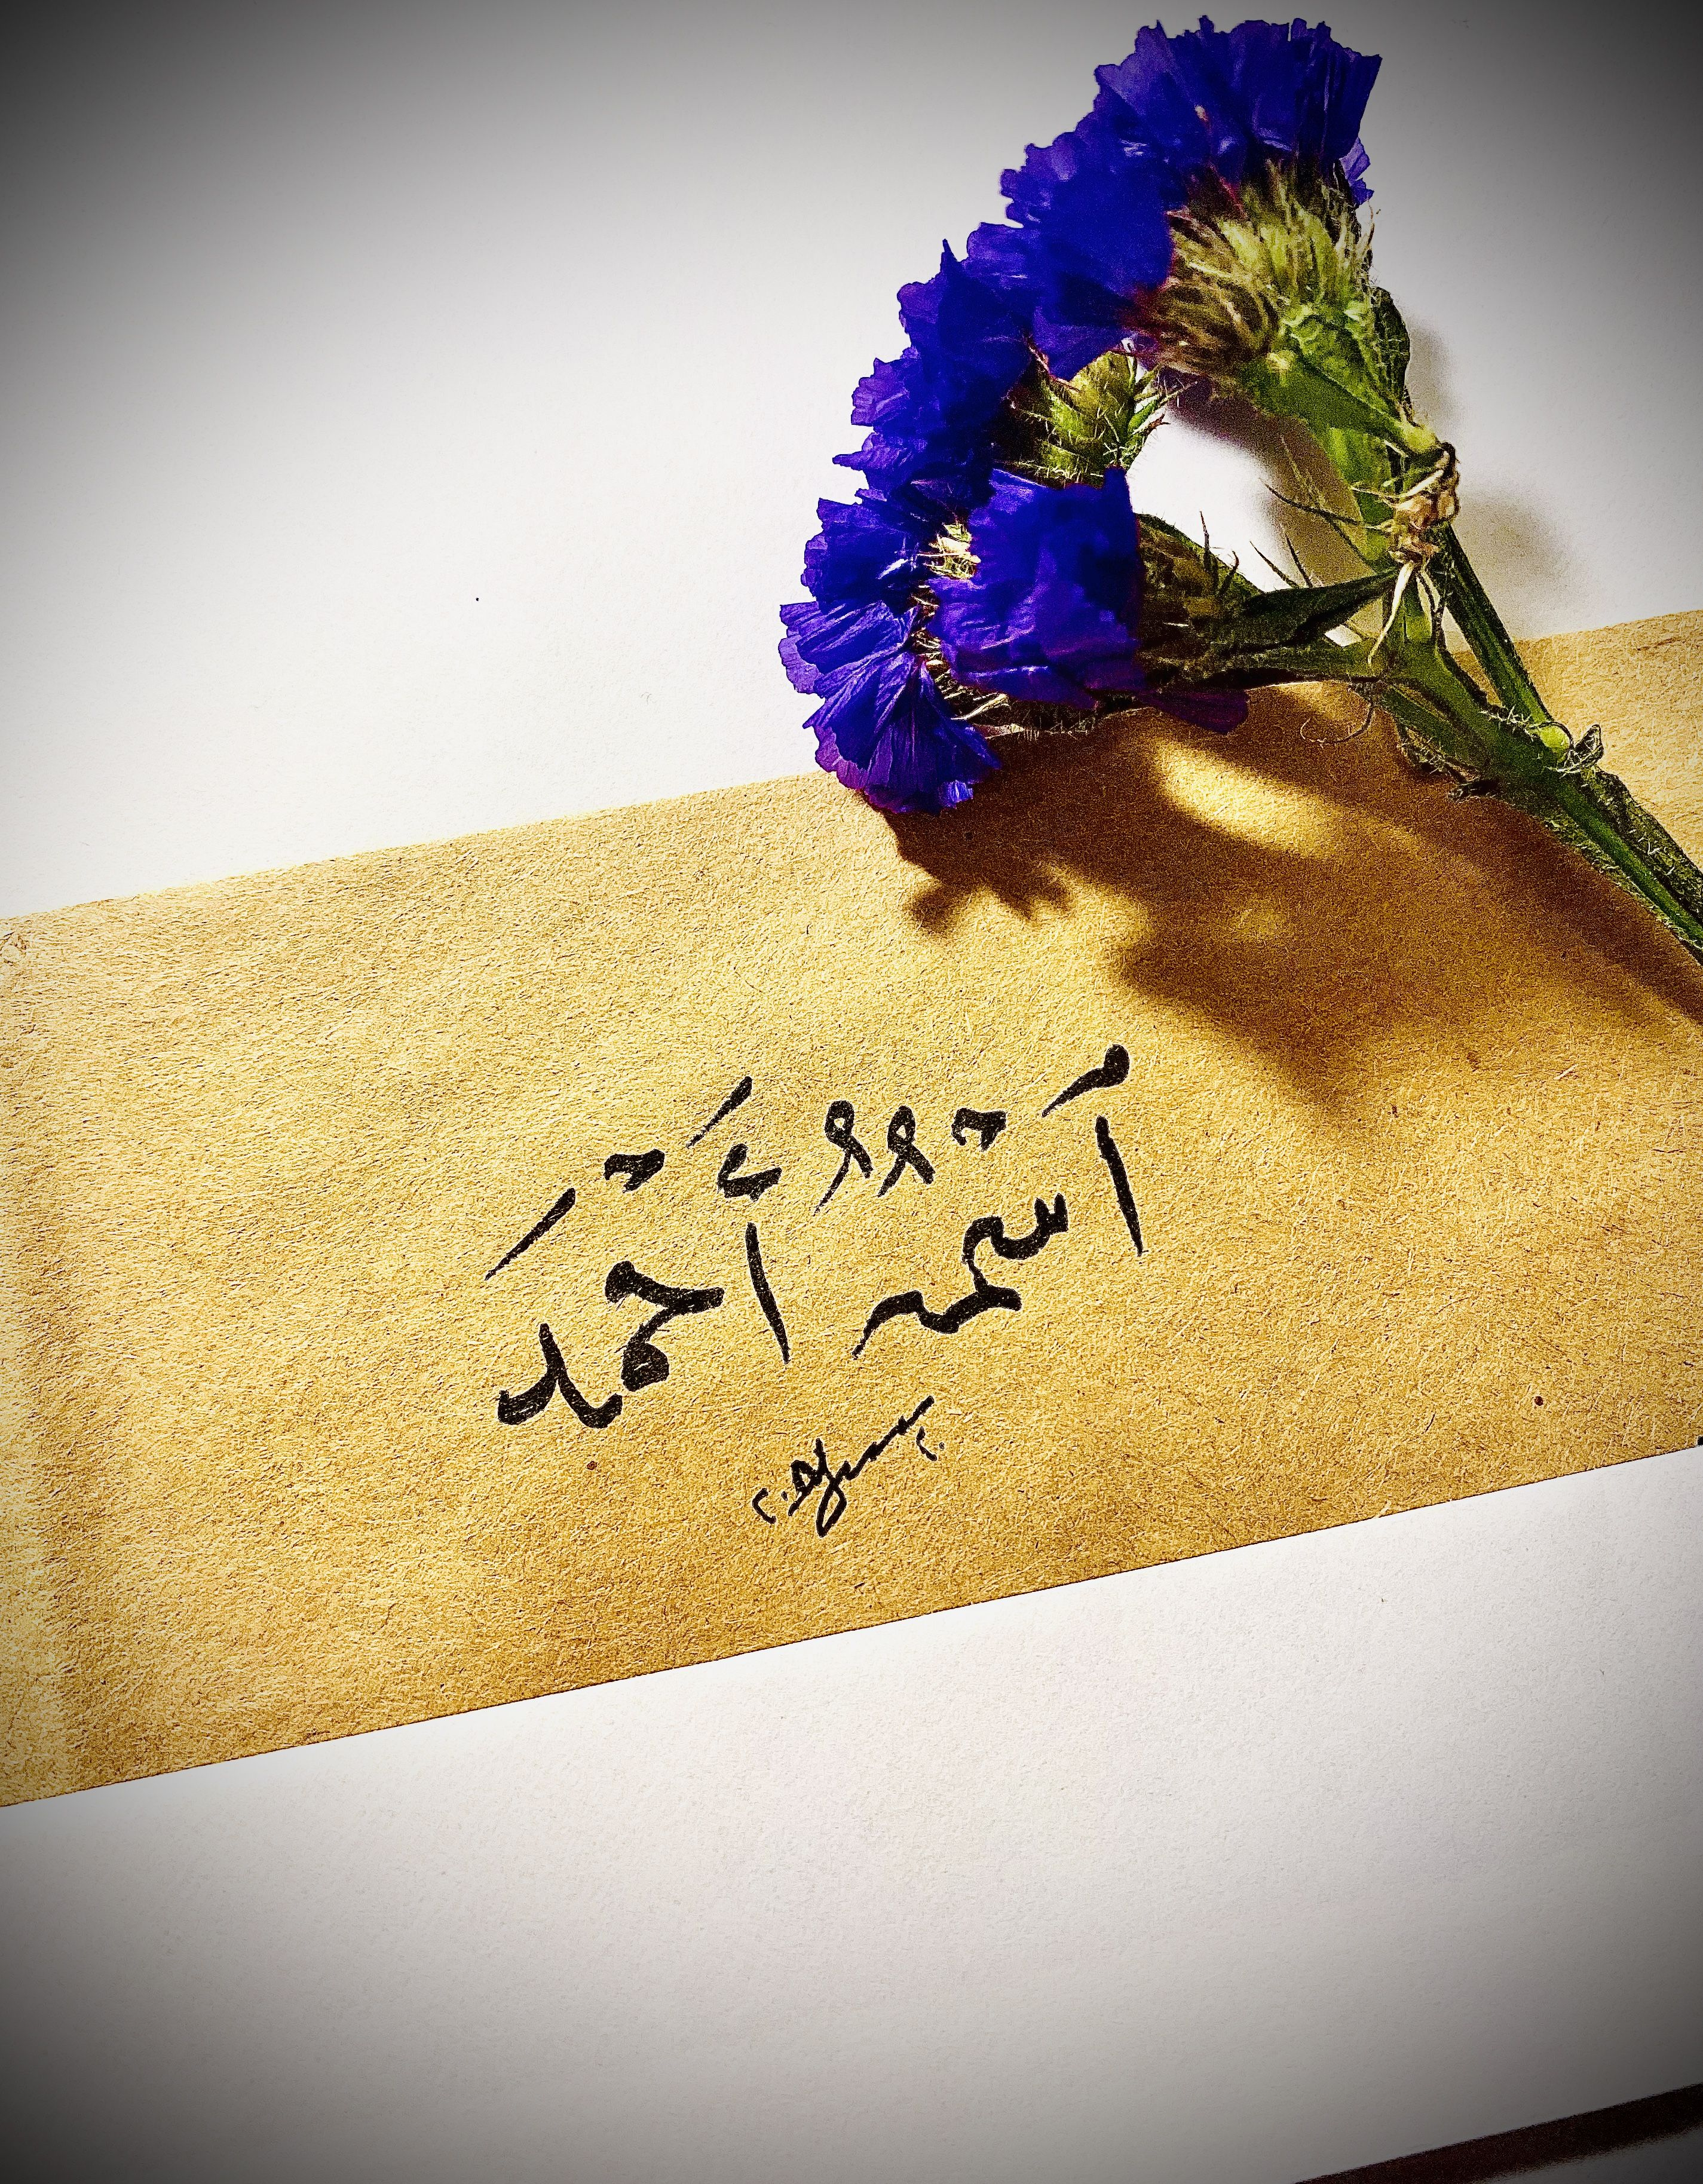 ومبشرا برسول ياتي من بعدي اسمه احمد اسم احمد اسم احمد Arabic Quotes Qoutes Decor